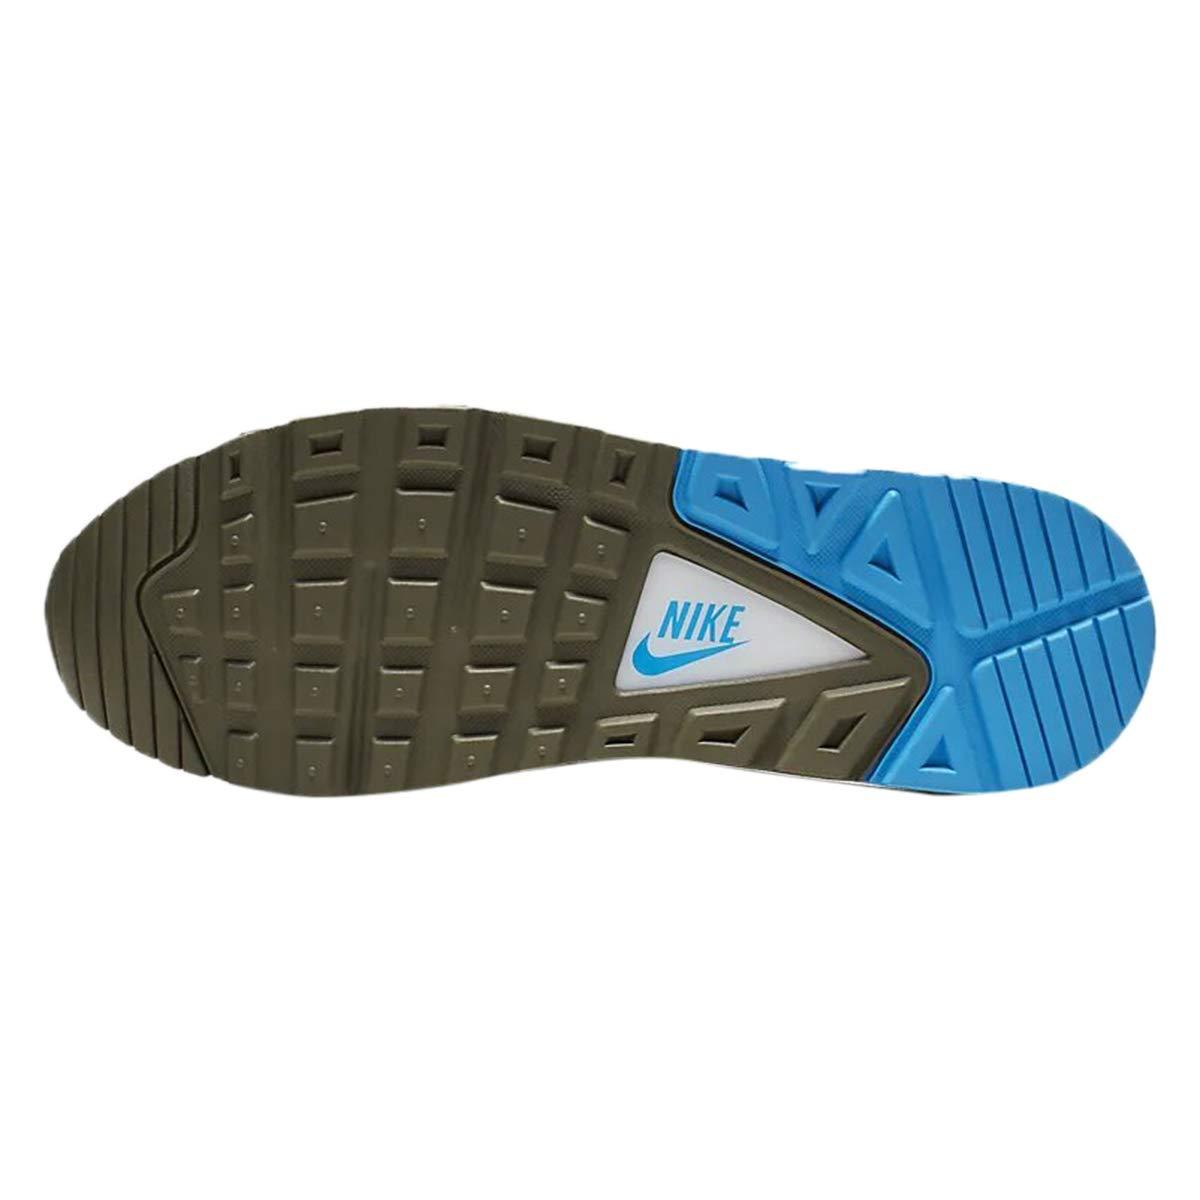 Nike Air MAX Command, Hauszapatos de Trail Running para Hombre MultiColor (blanco Pure Platinum Medium Olive 109)